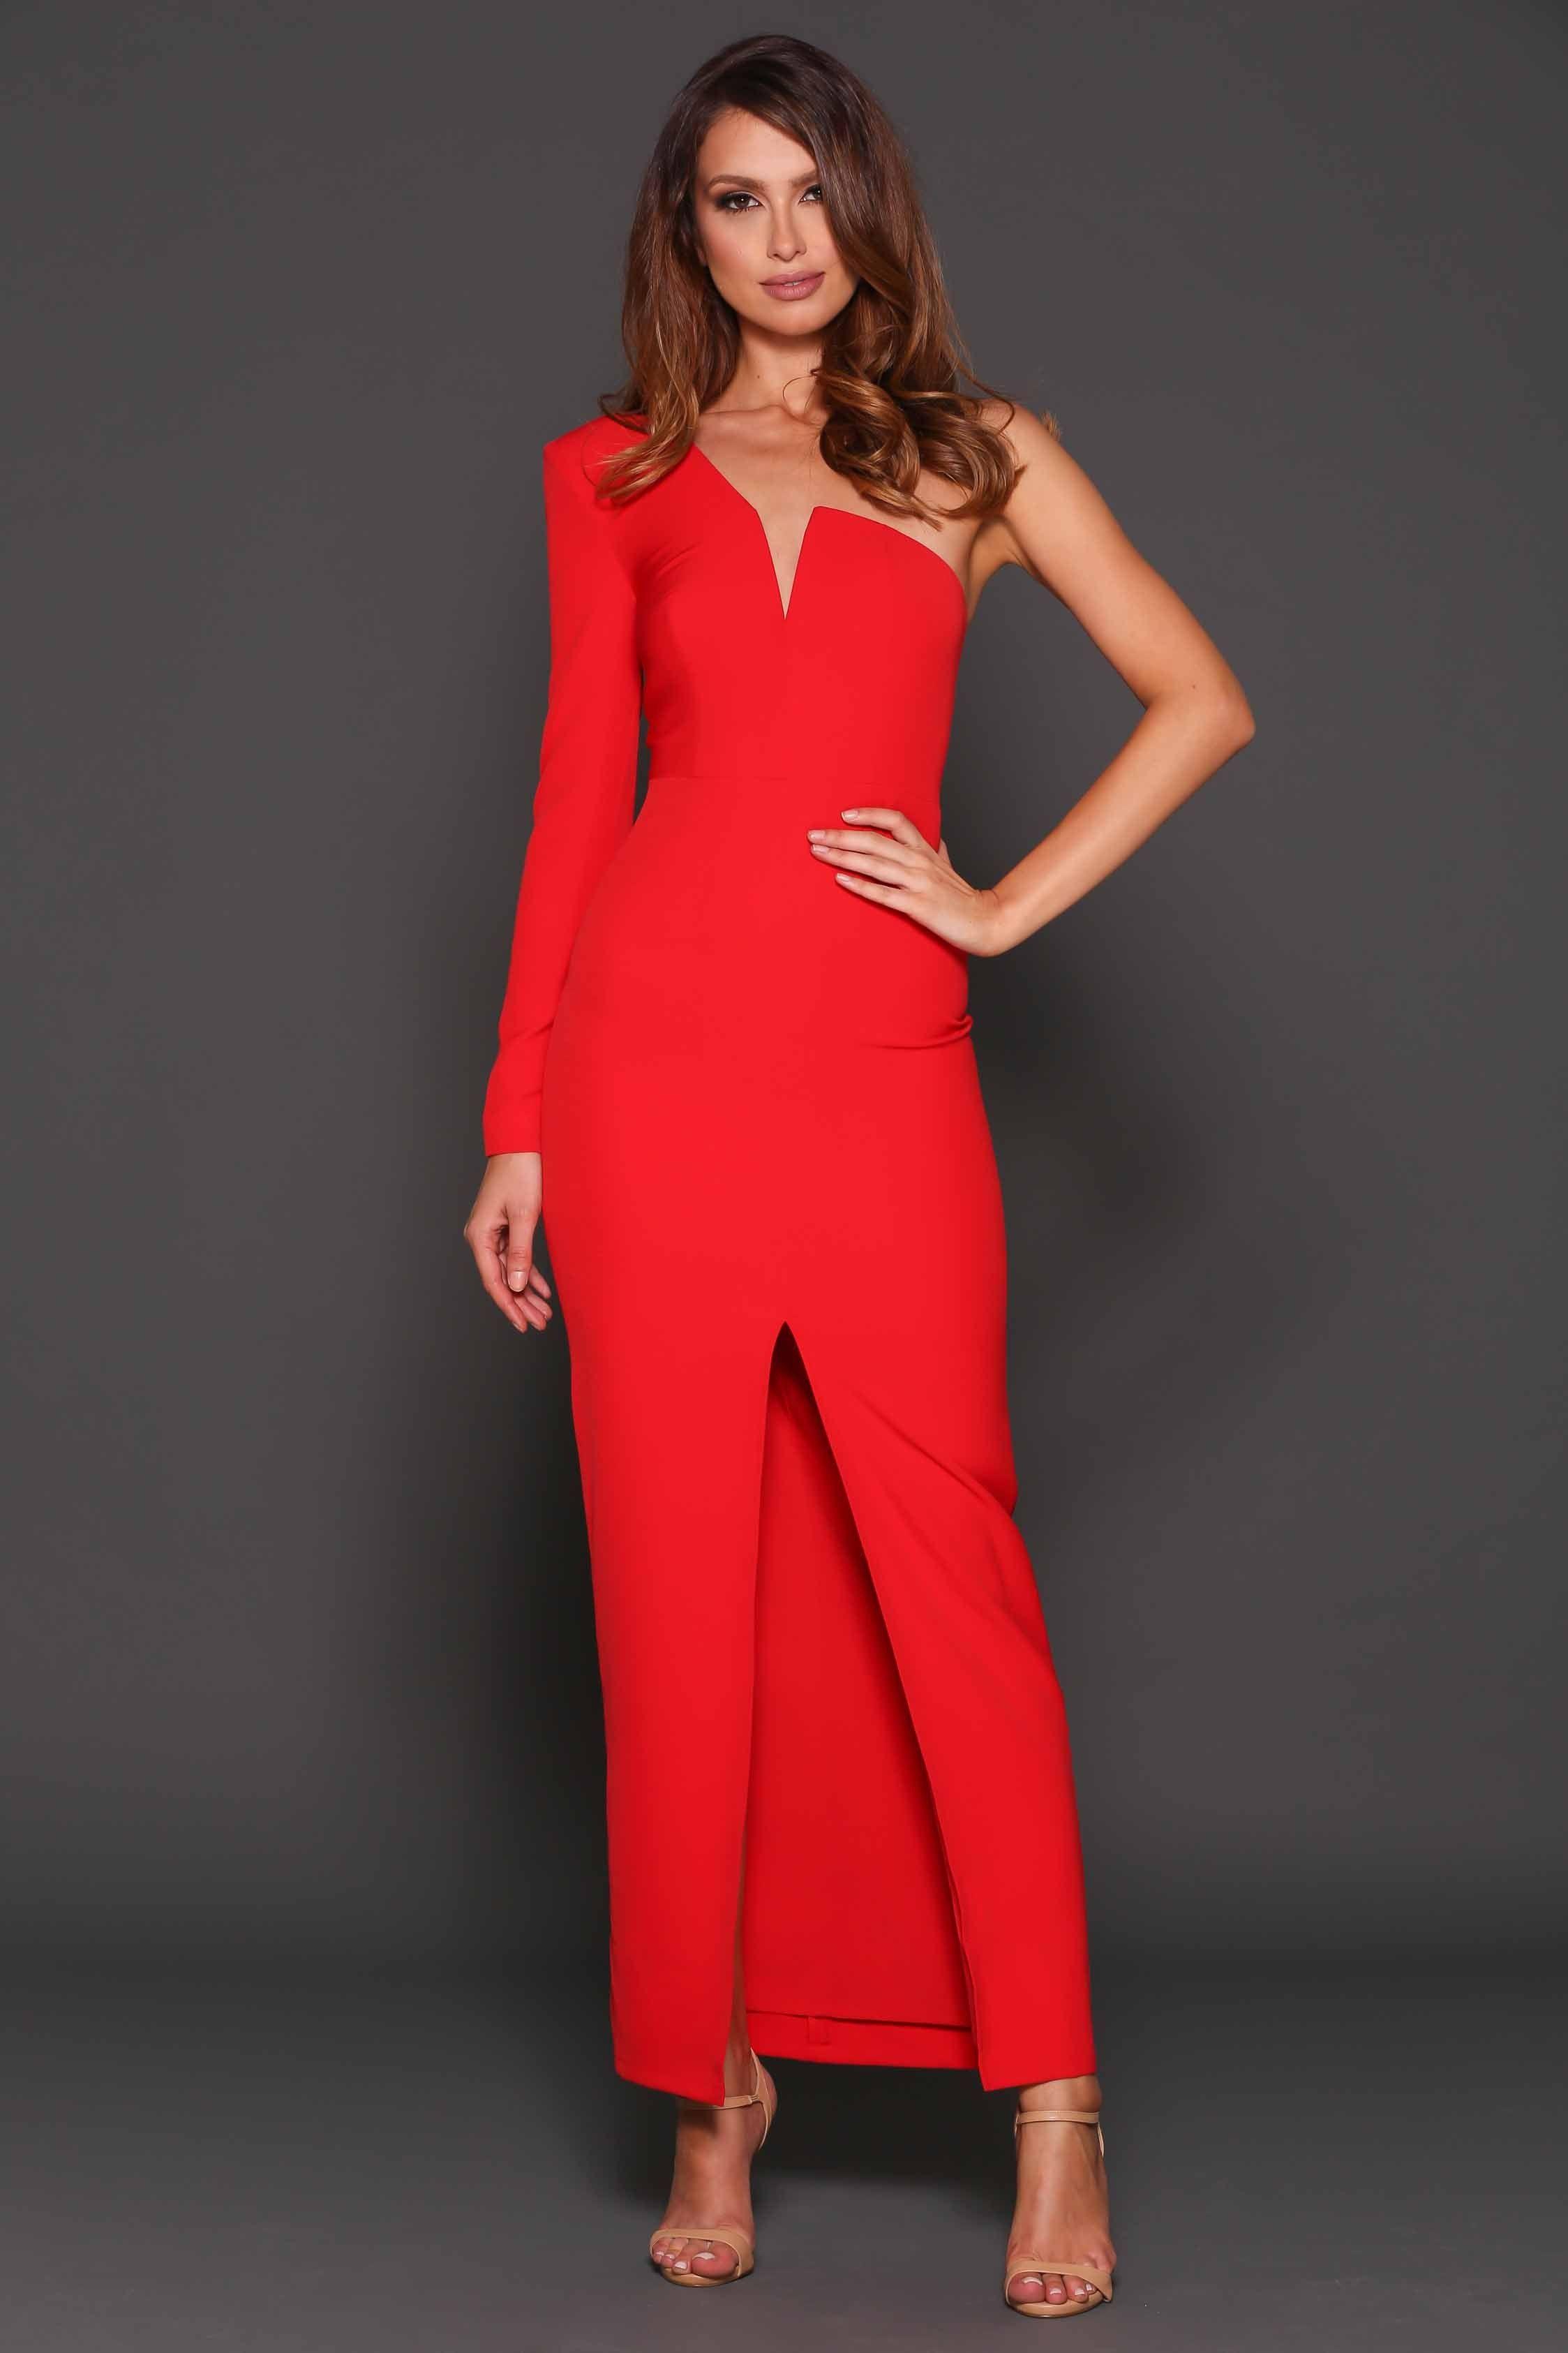 Nyla red womenus fashion pinterest red dresses and fashion